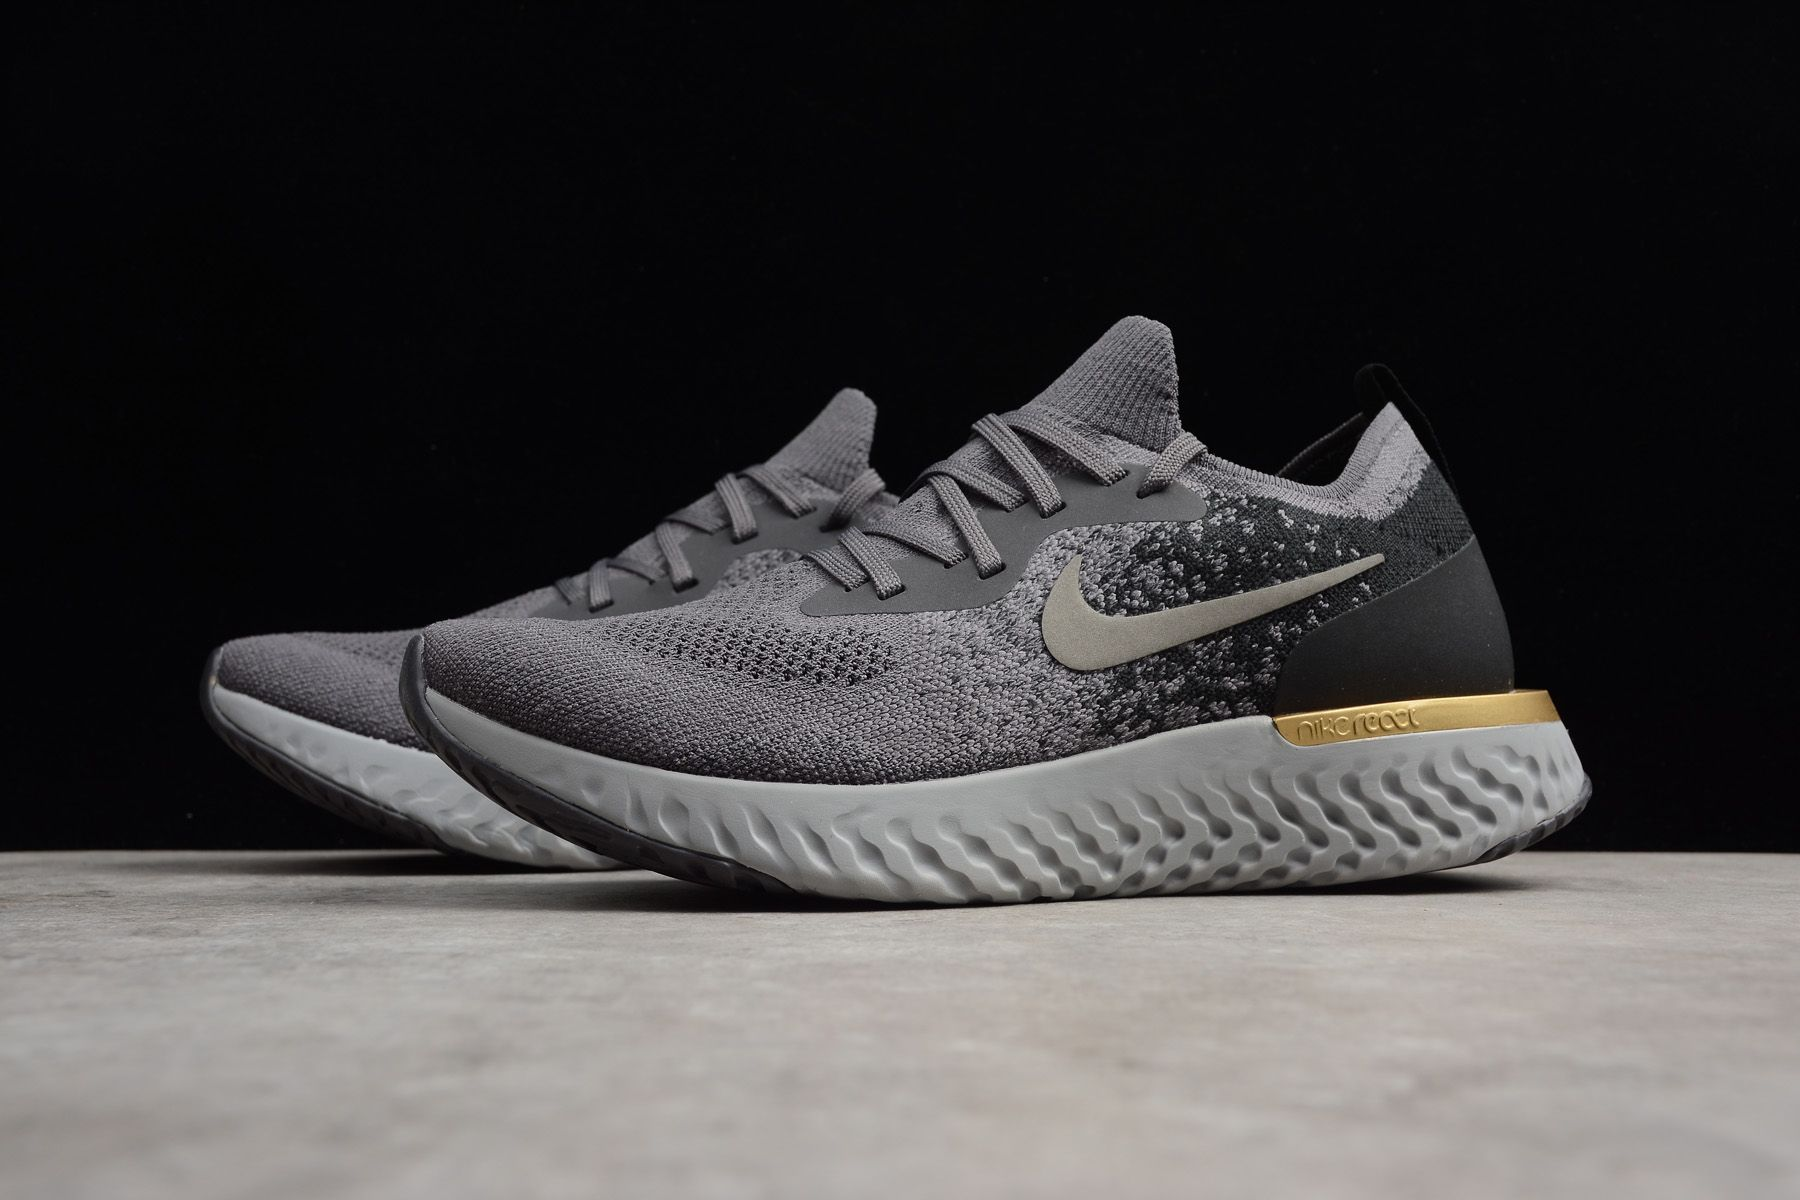 209d9b7747acc 2018 Nike Epic React Flyknit Grey Black-Gold Running Shoes